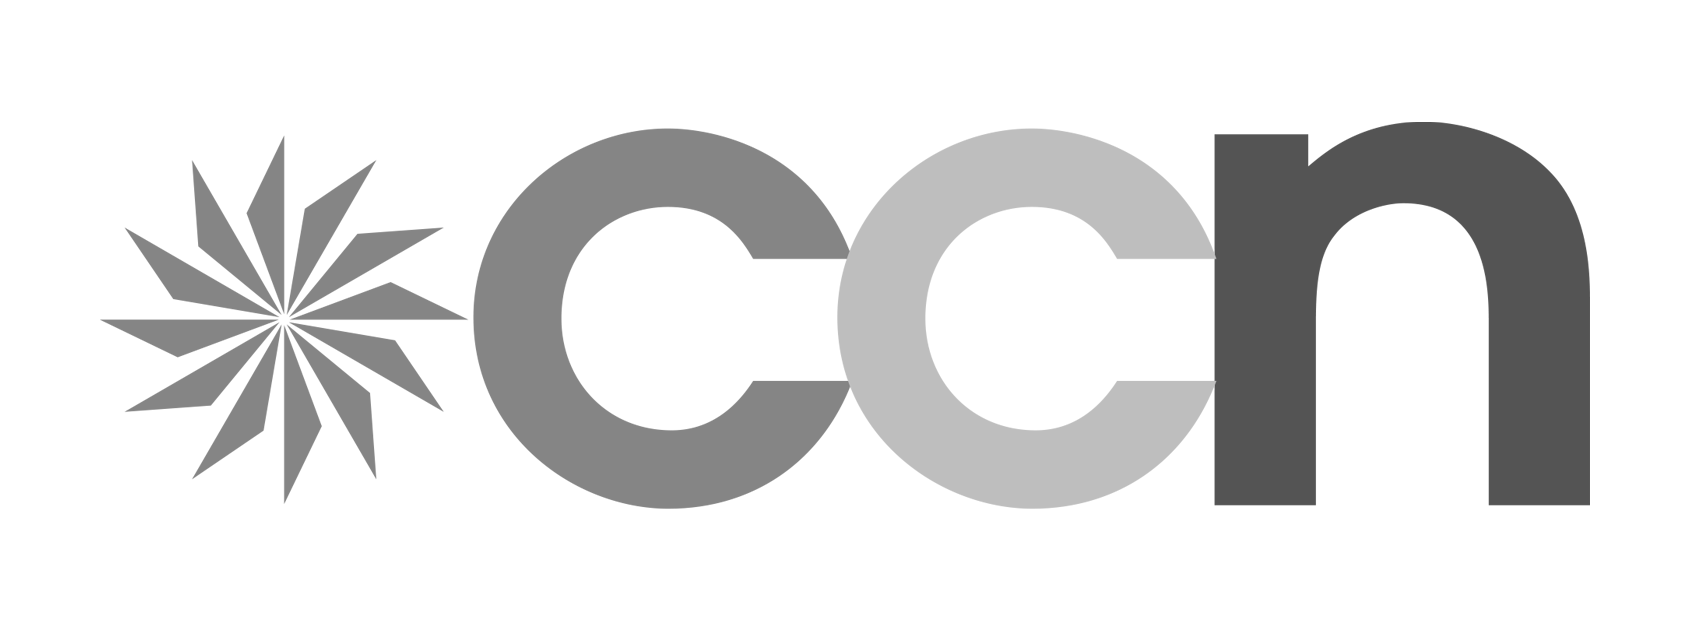 CCN-masthead-bw